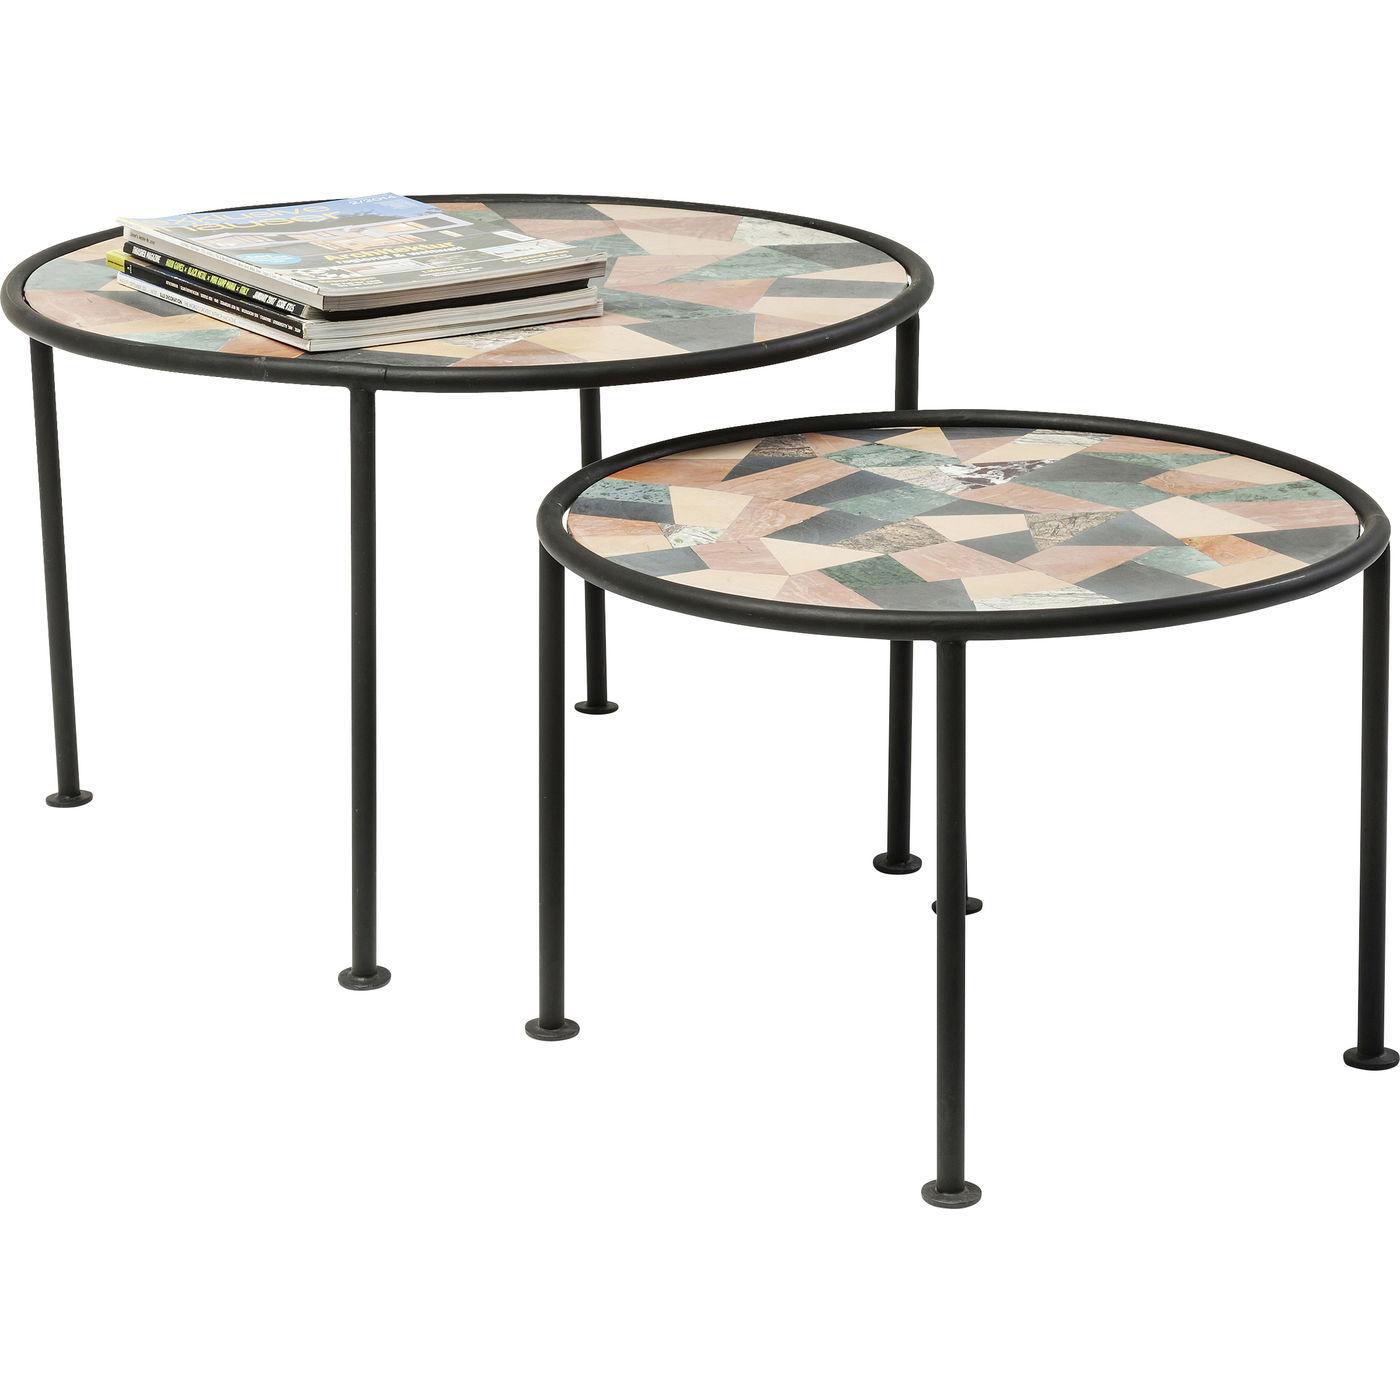 KARE DESIGN Coccio sofabordsst - multifarvet metal, mosaik, rund (st m. 2)